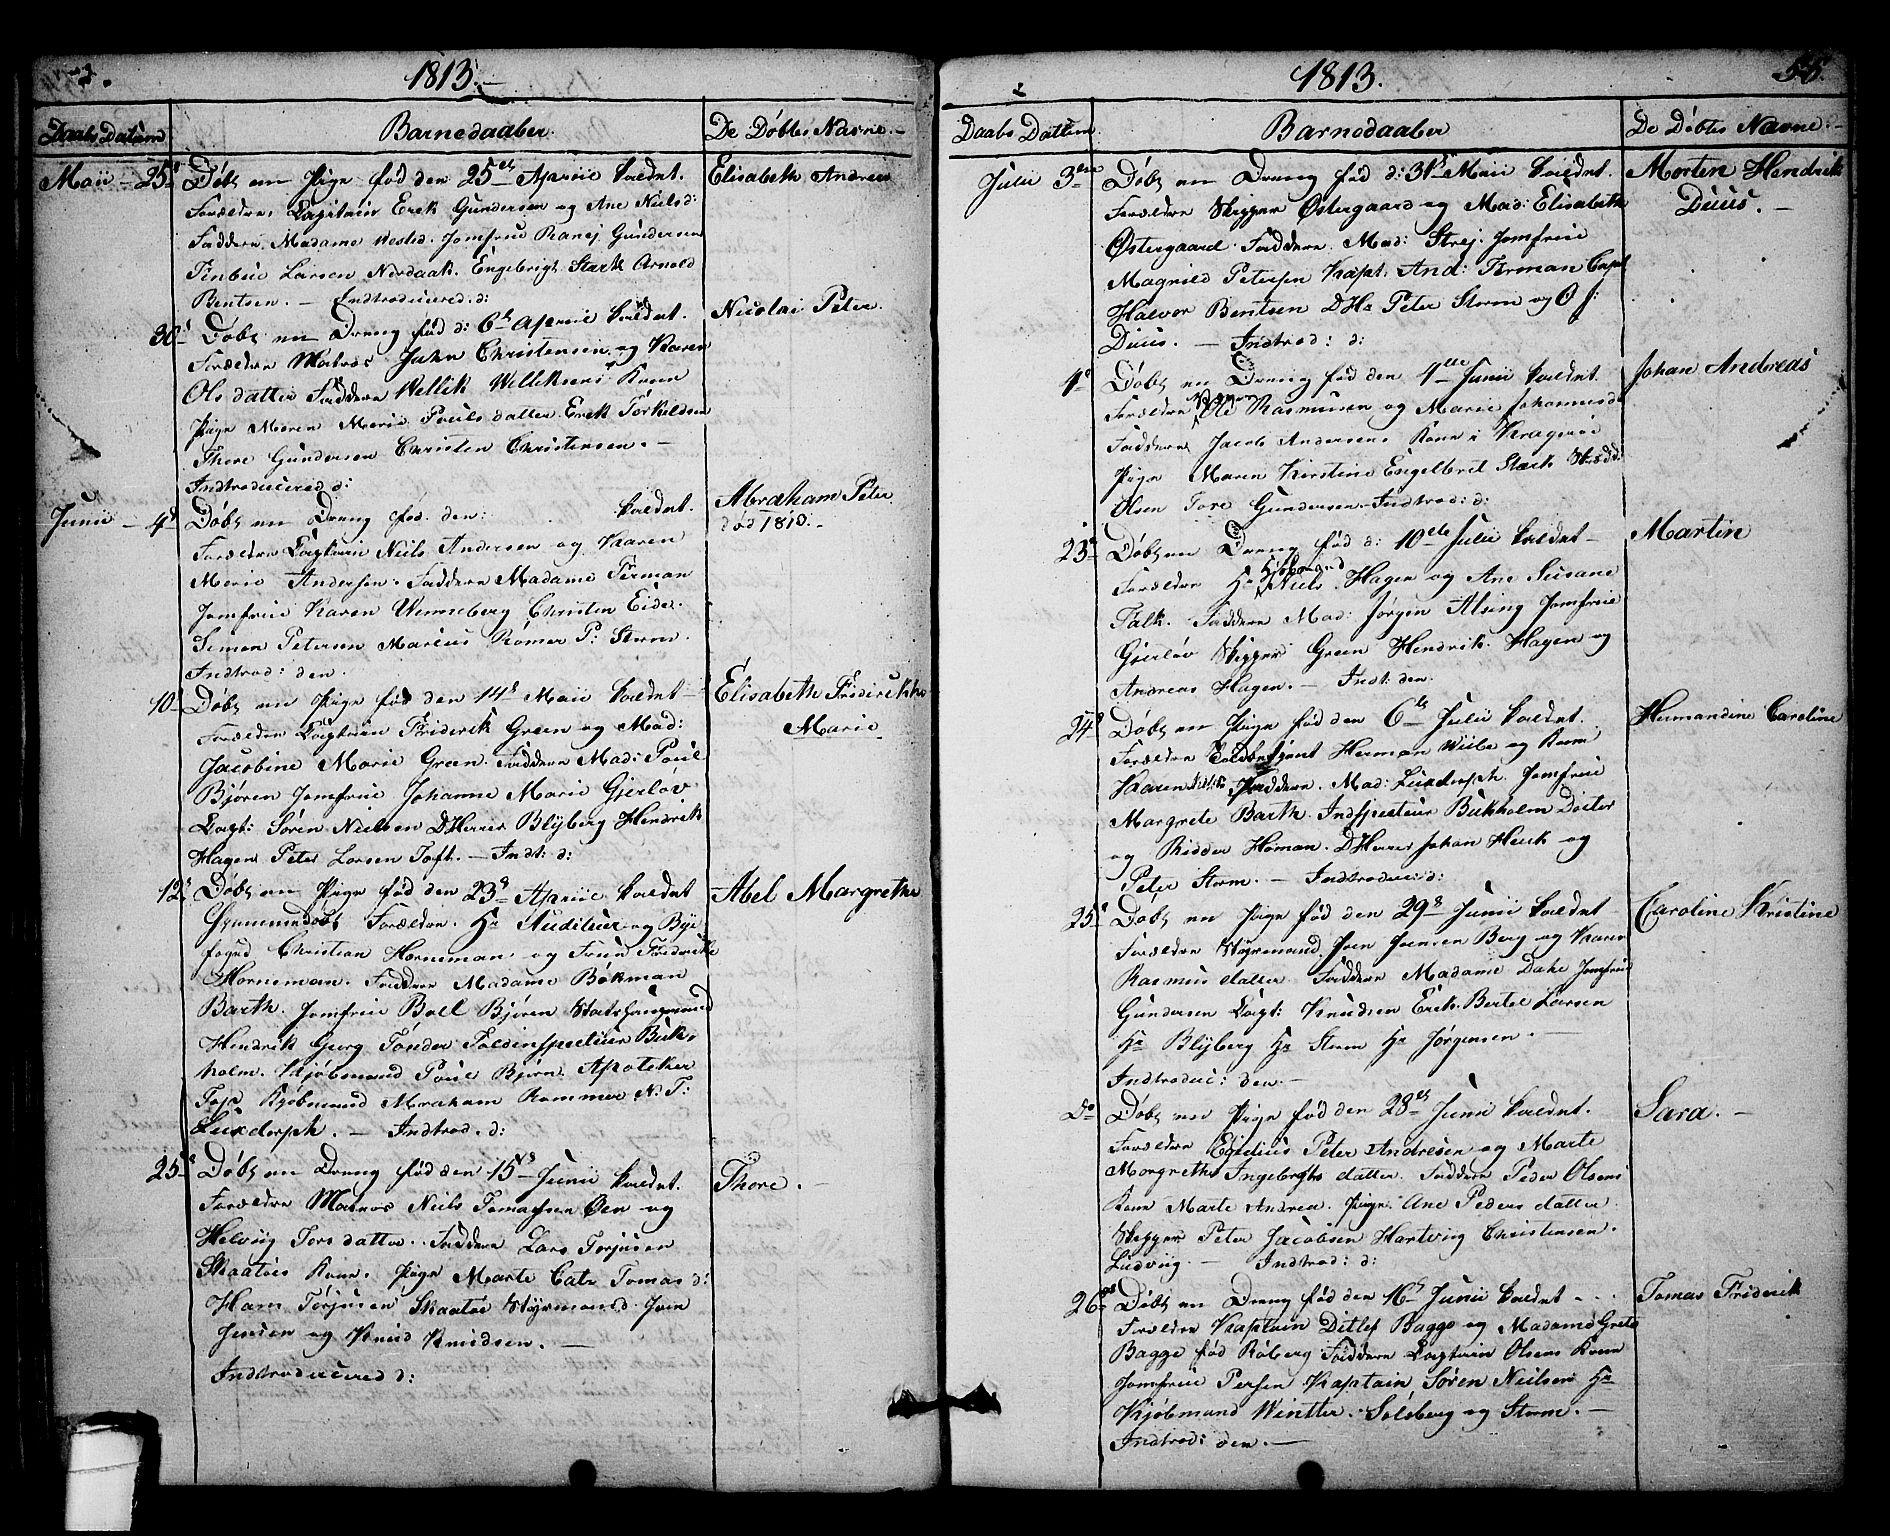 SAKO, Kragerø kirkebøker, F/Fa/L0003: Parish register (official) no. 3, 1802-1813, p. 55